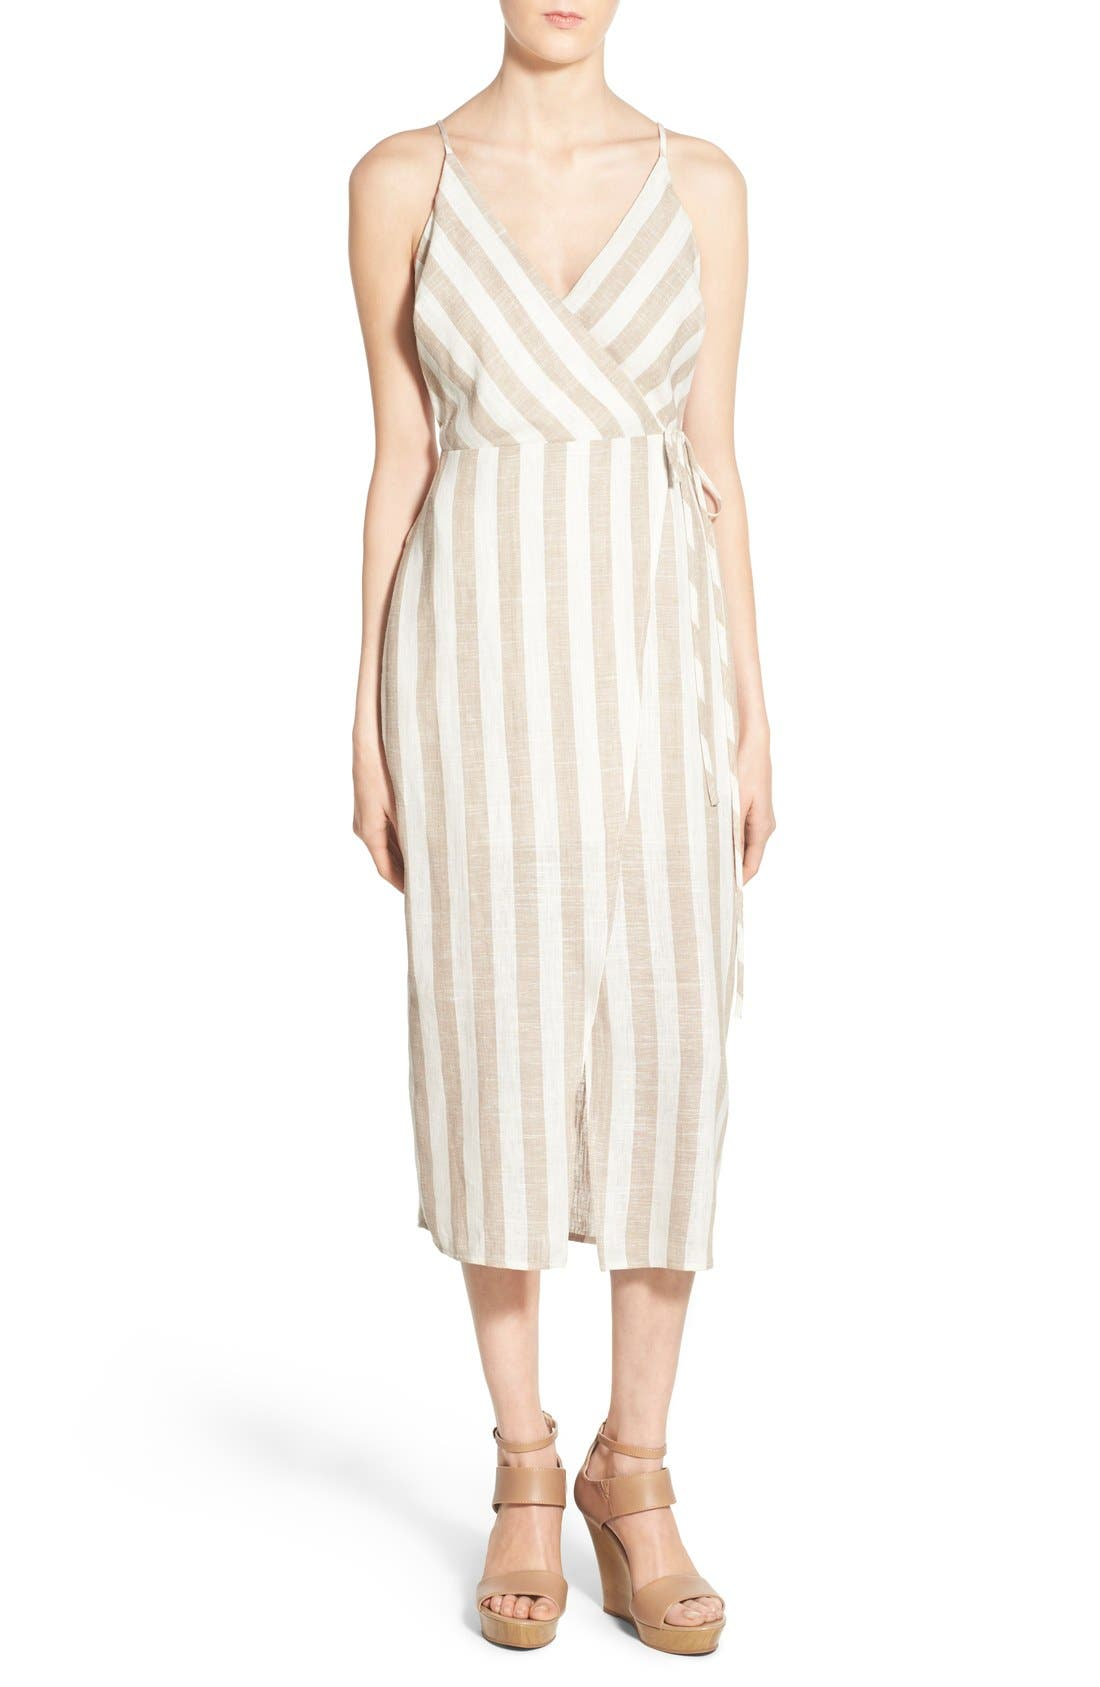 Alternate Image 1 Selected - ASTR Linen Blend Wrap Dress